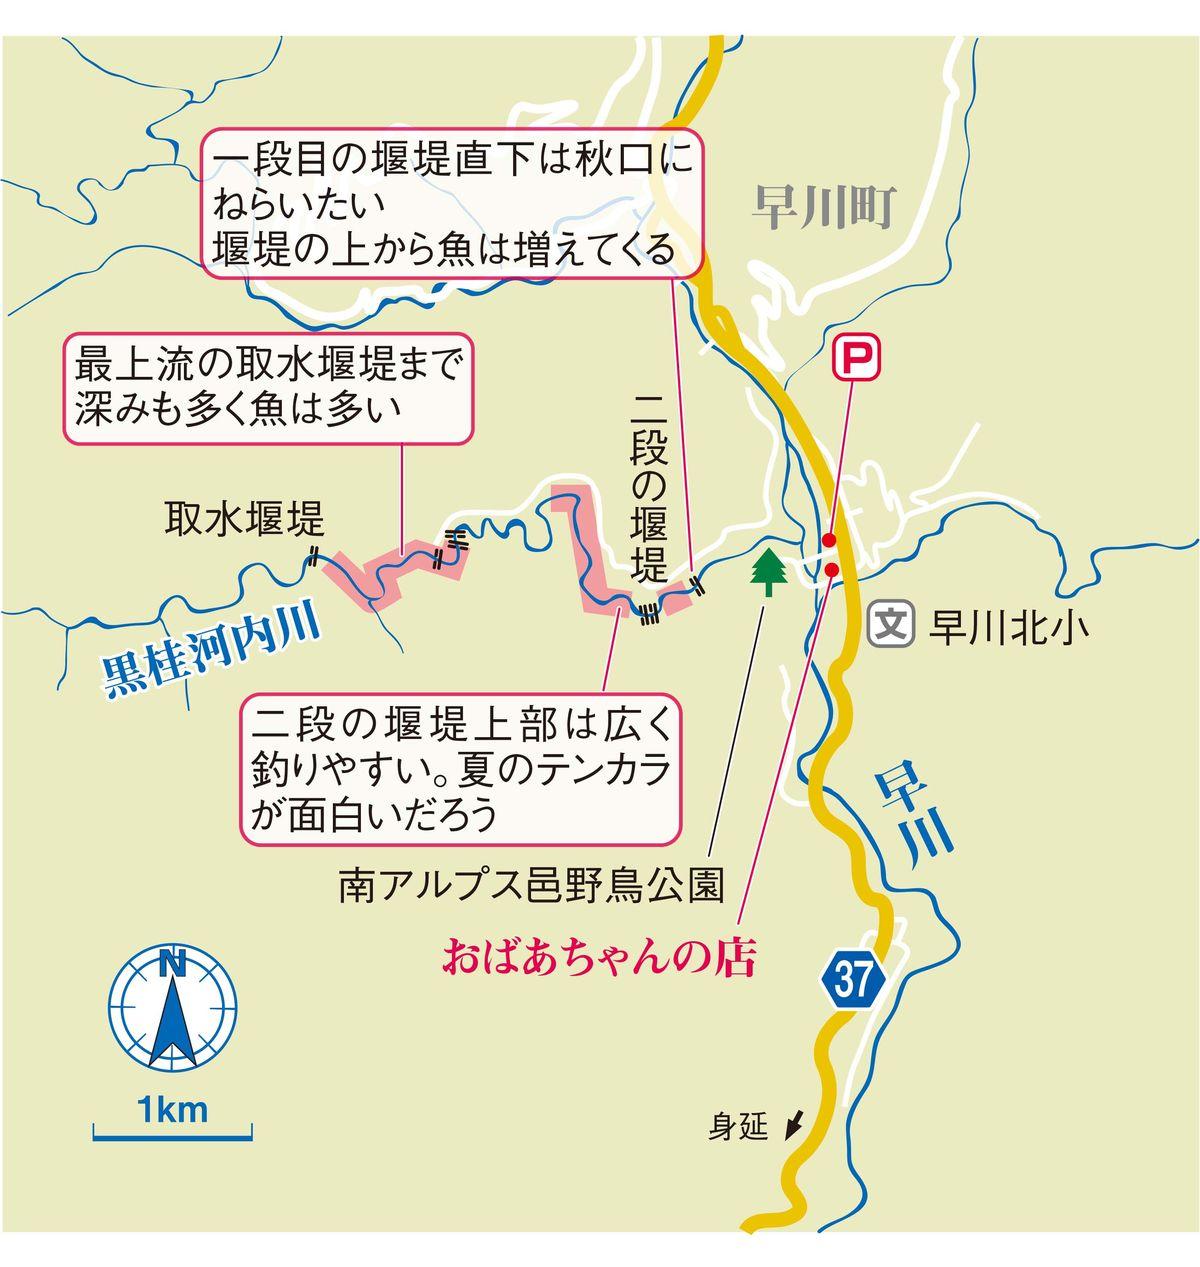 039-051best keiryu_cs6 (4)